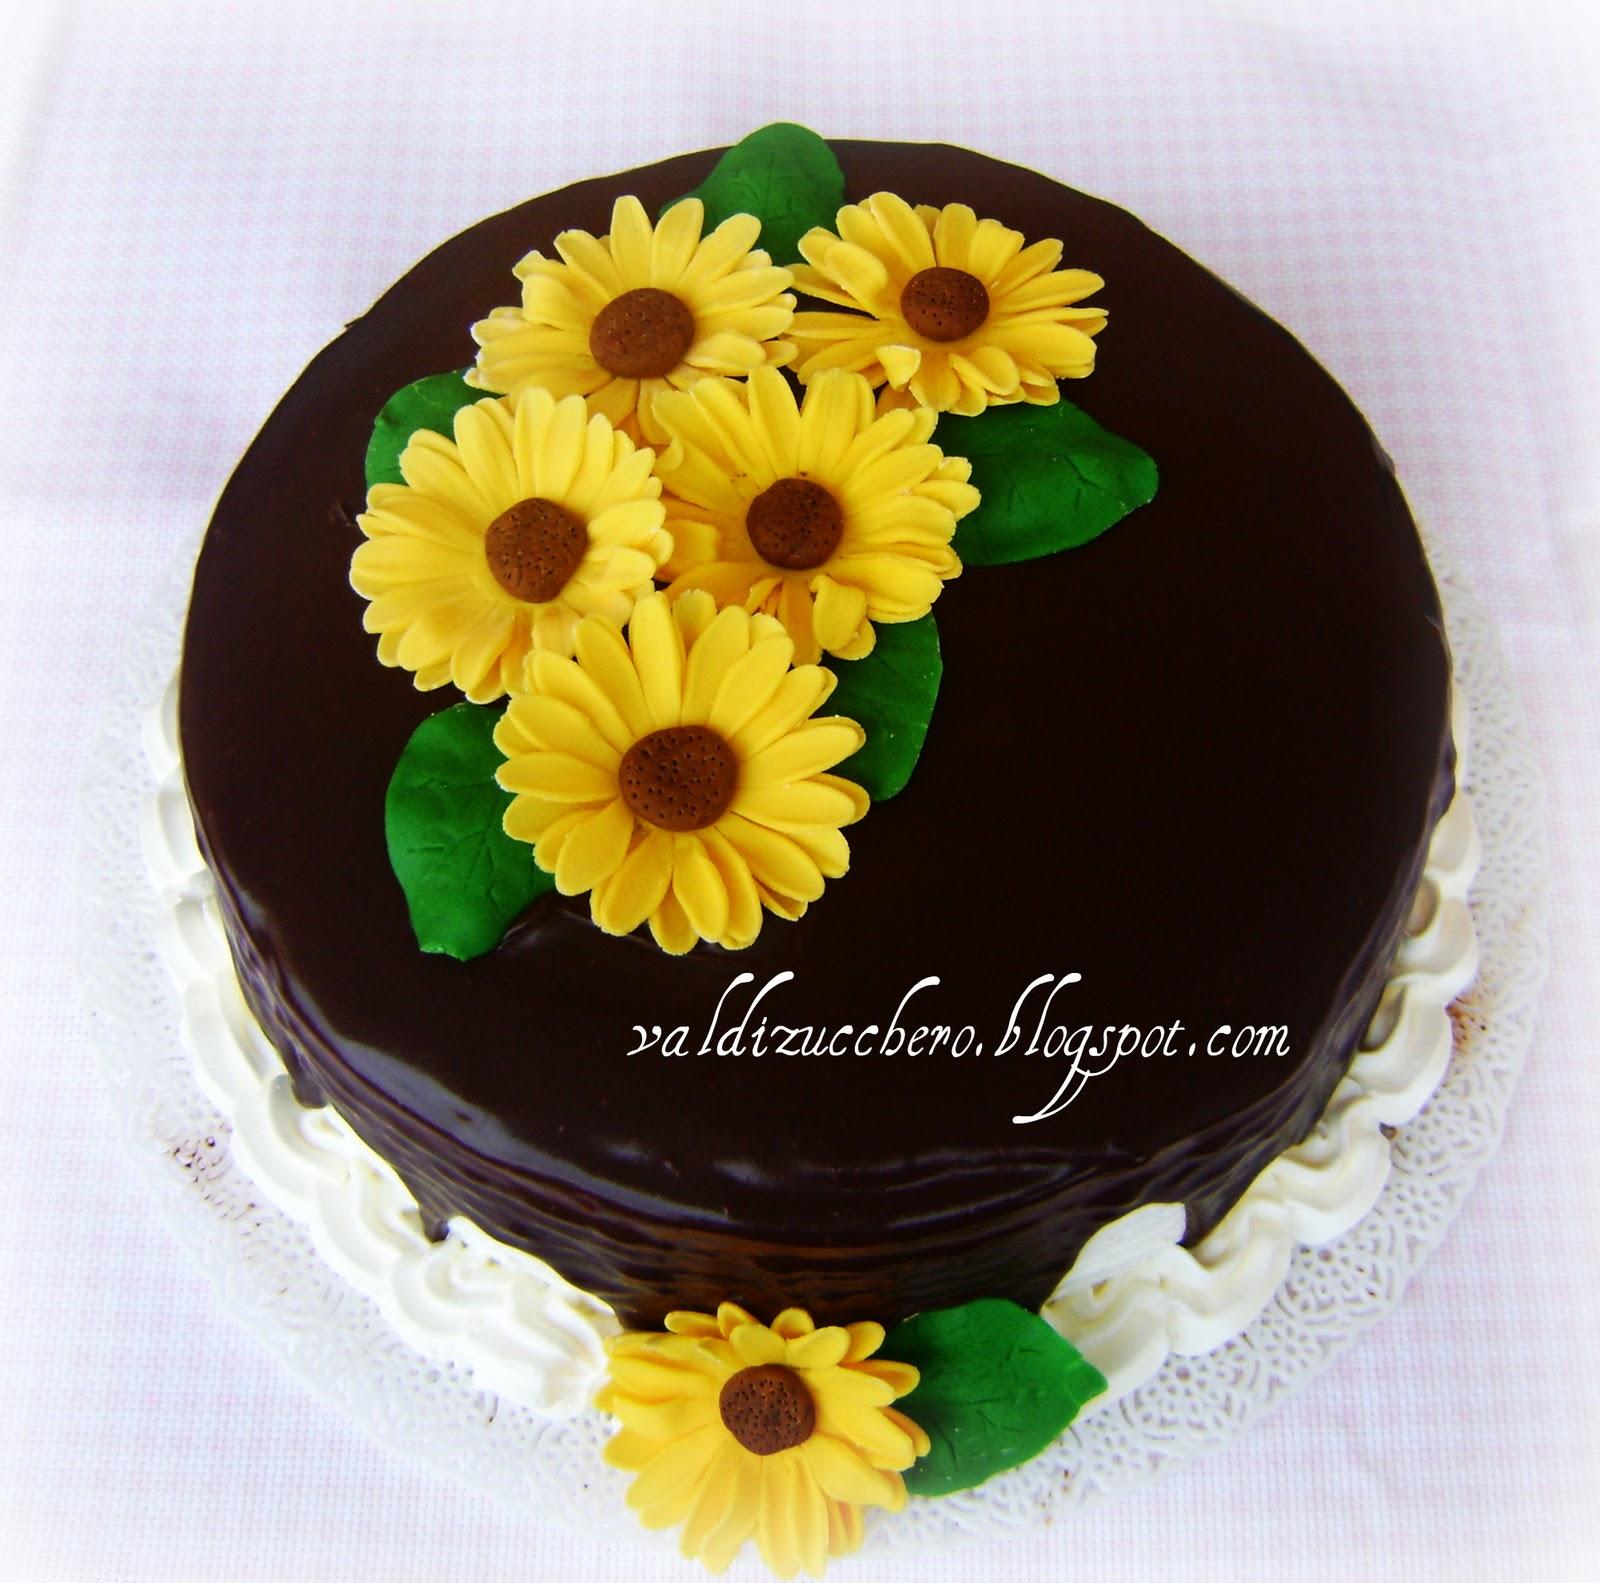 Torte Matrimonio Girasoli : Val di zucchero torta girasoli